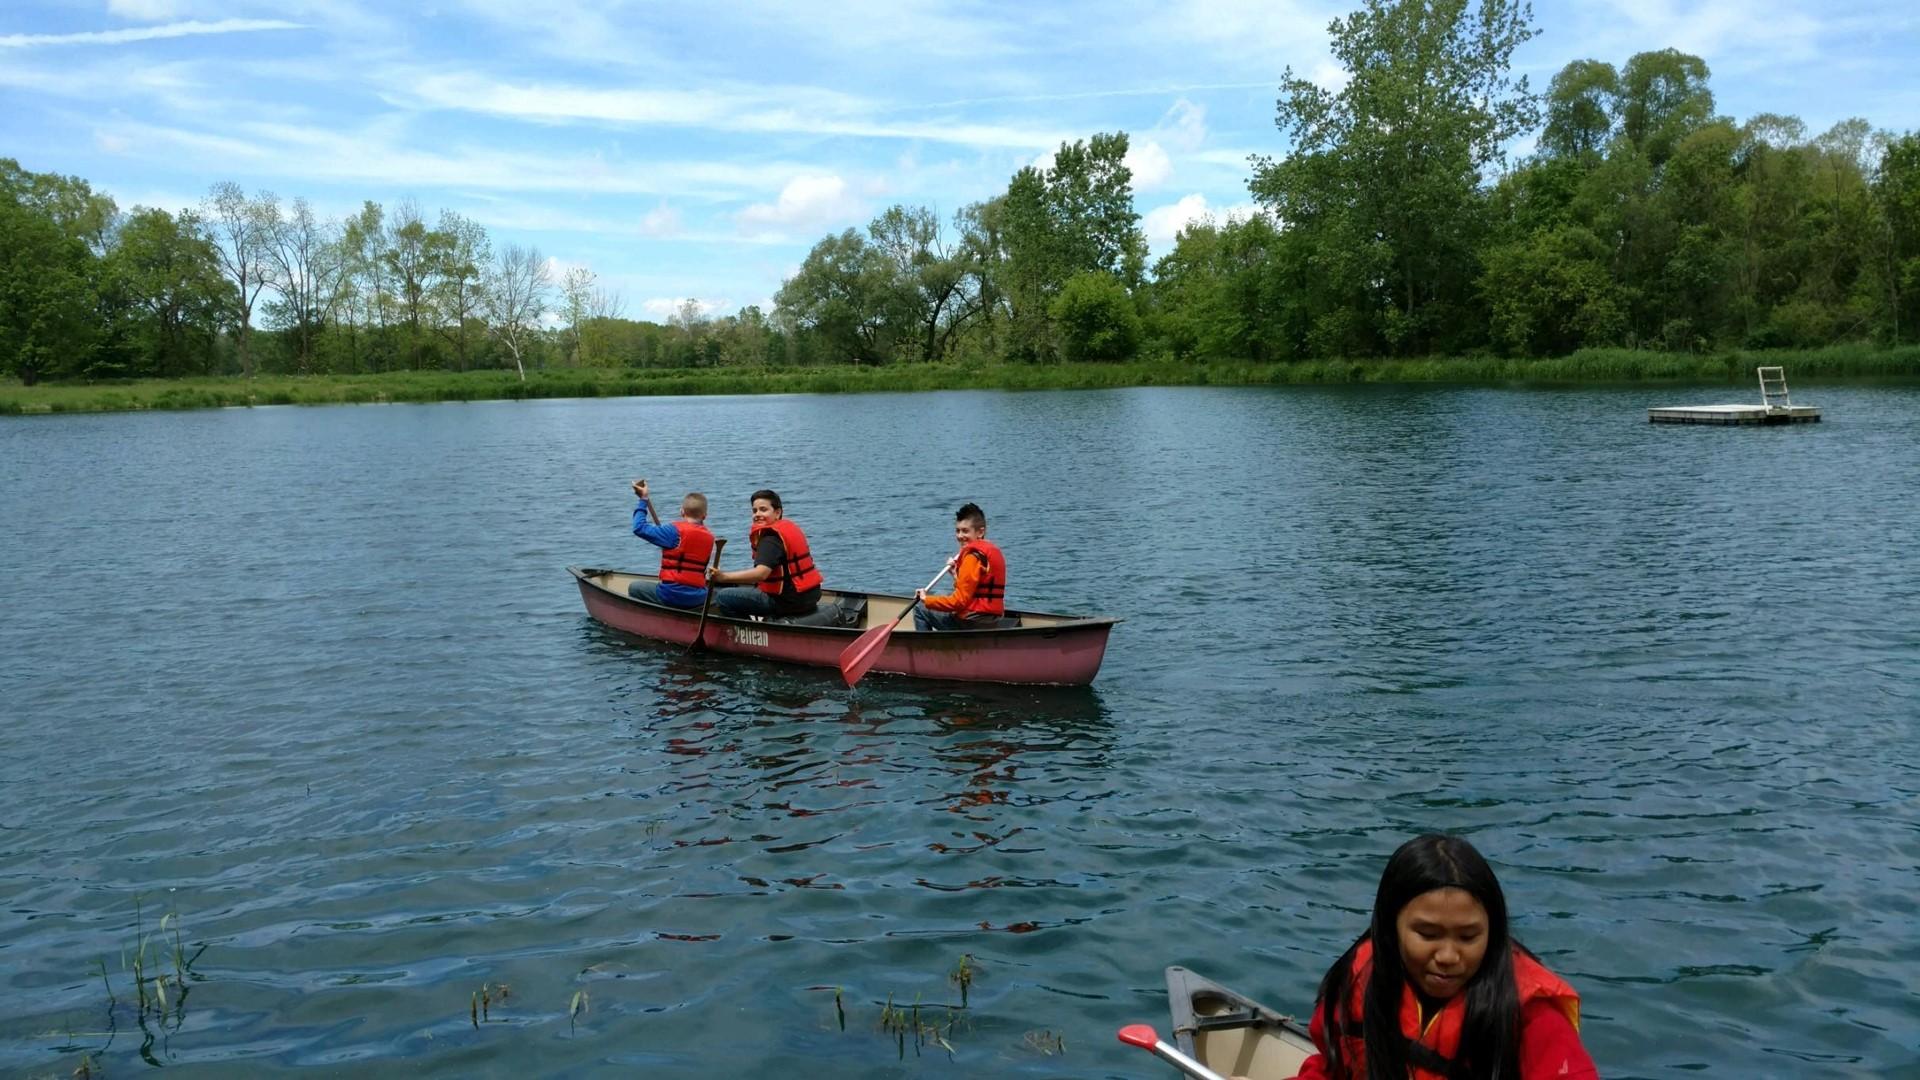 Beautiful day to canoe!